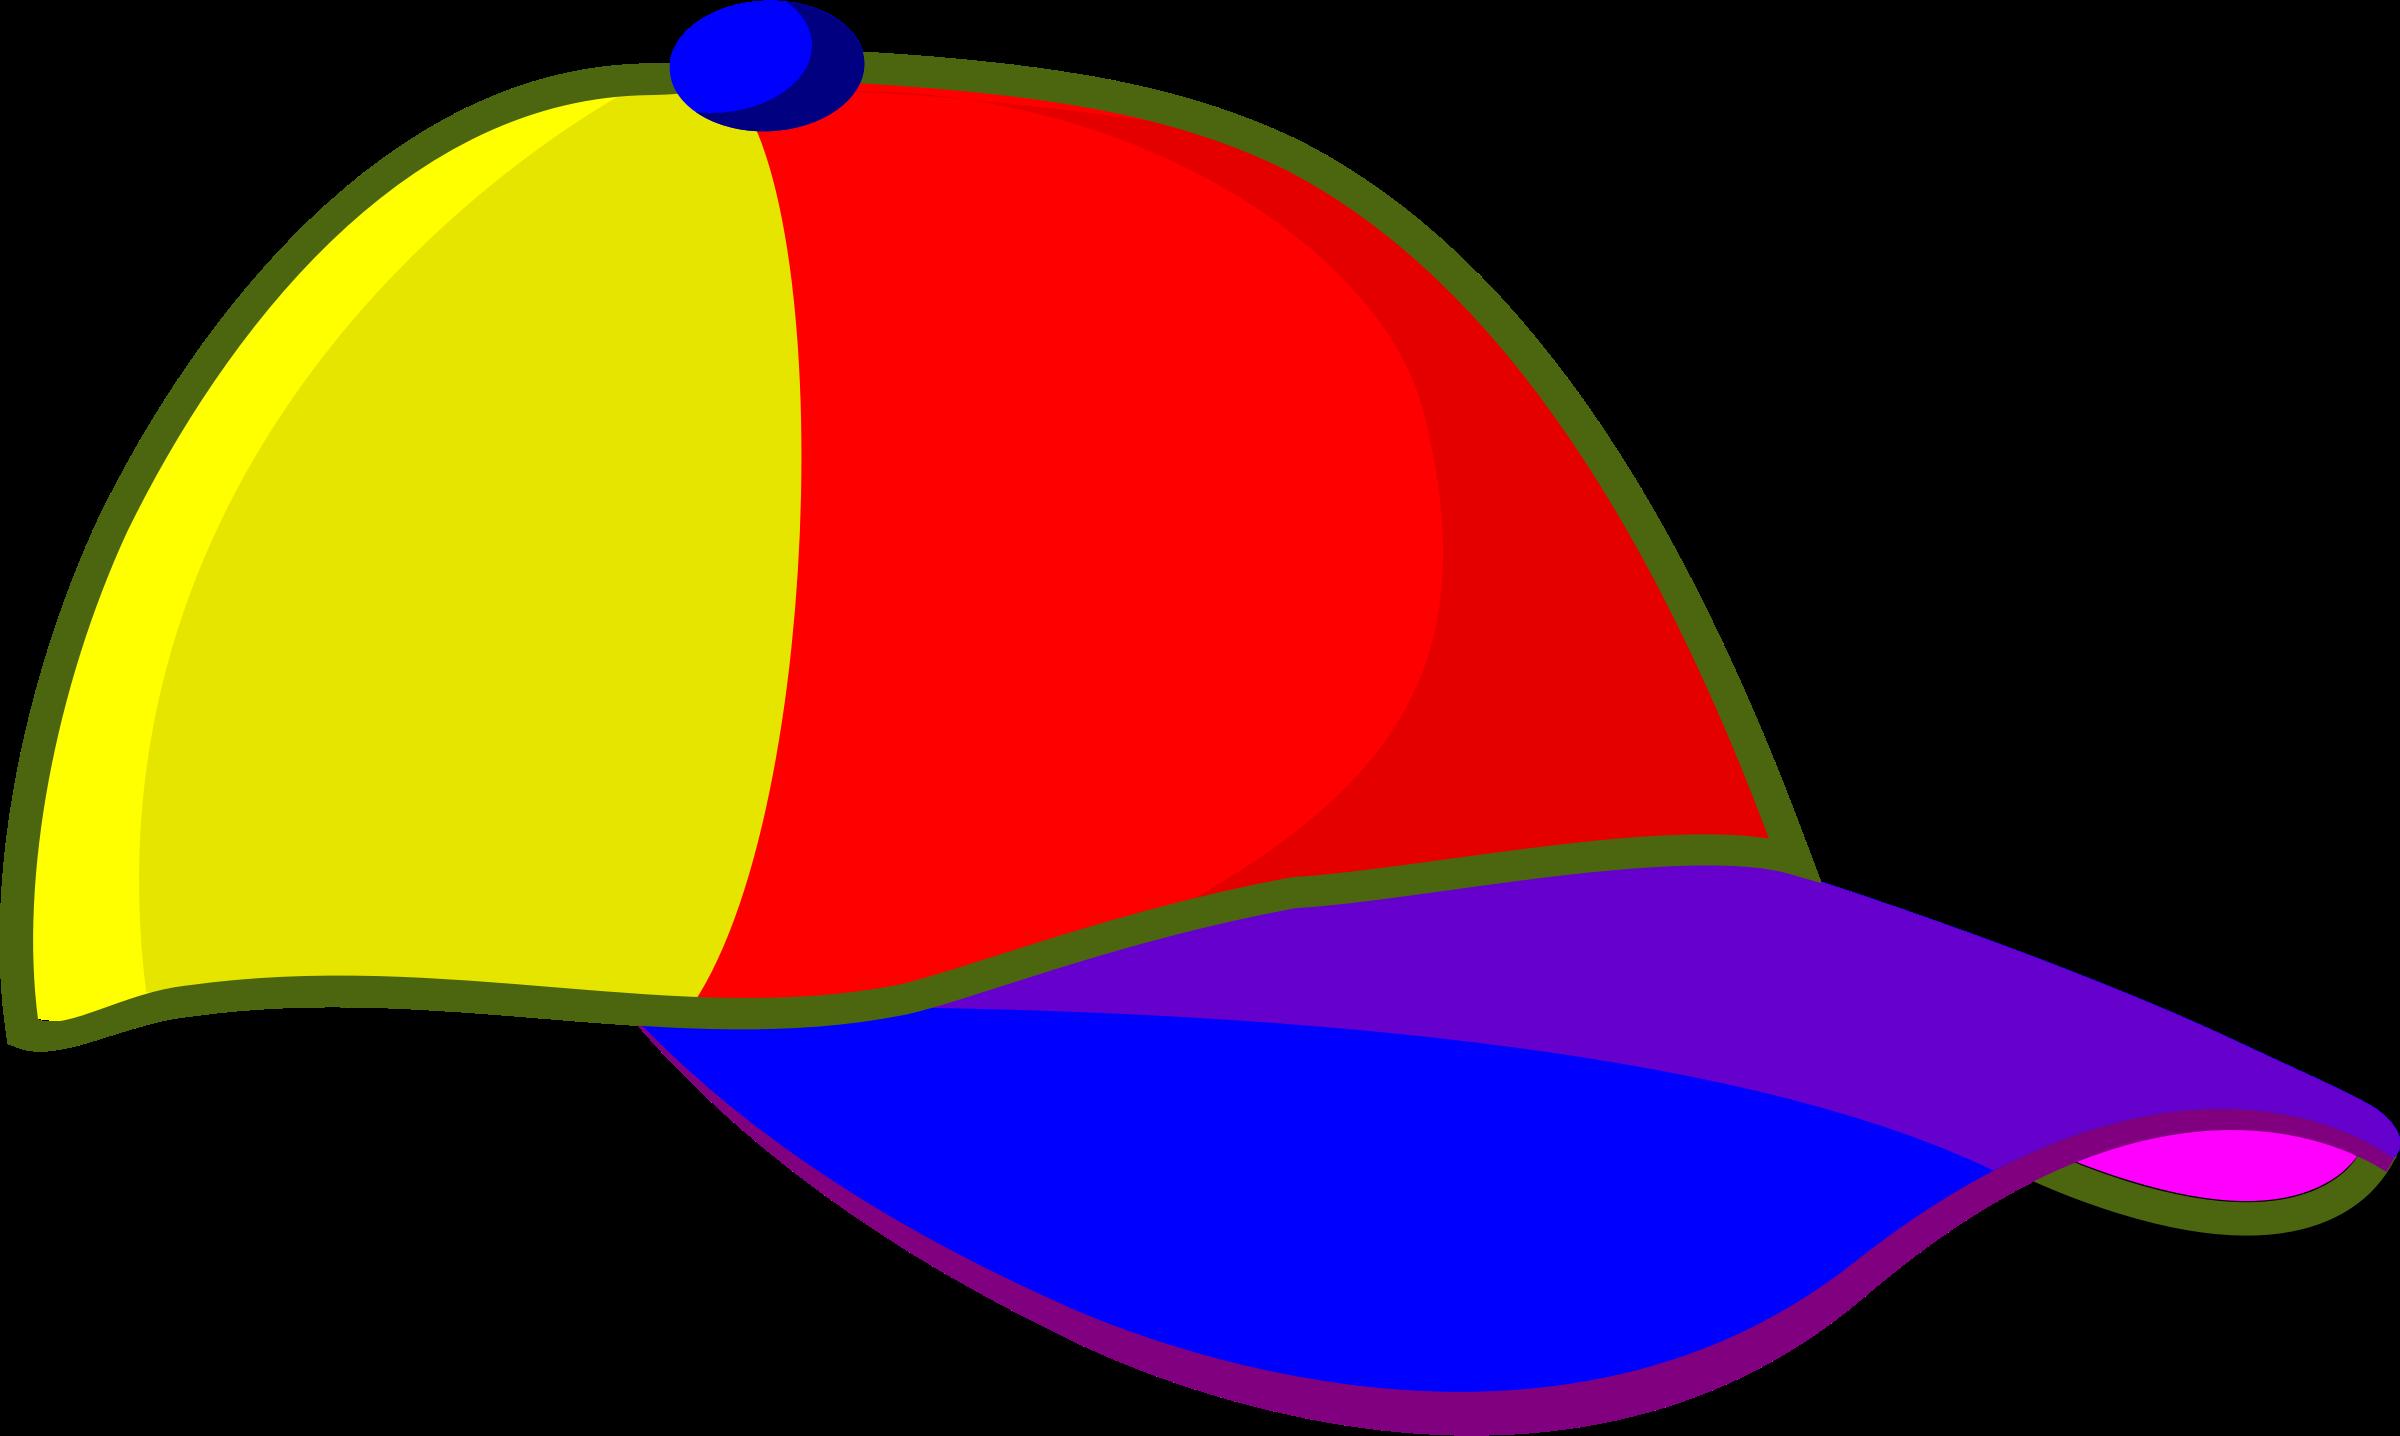 Cap clipart Clipart work Green cap hat